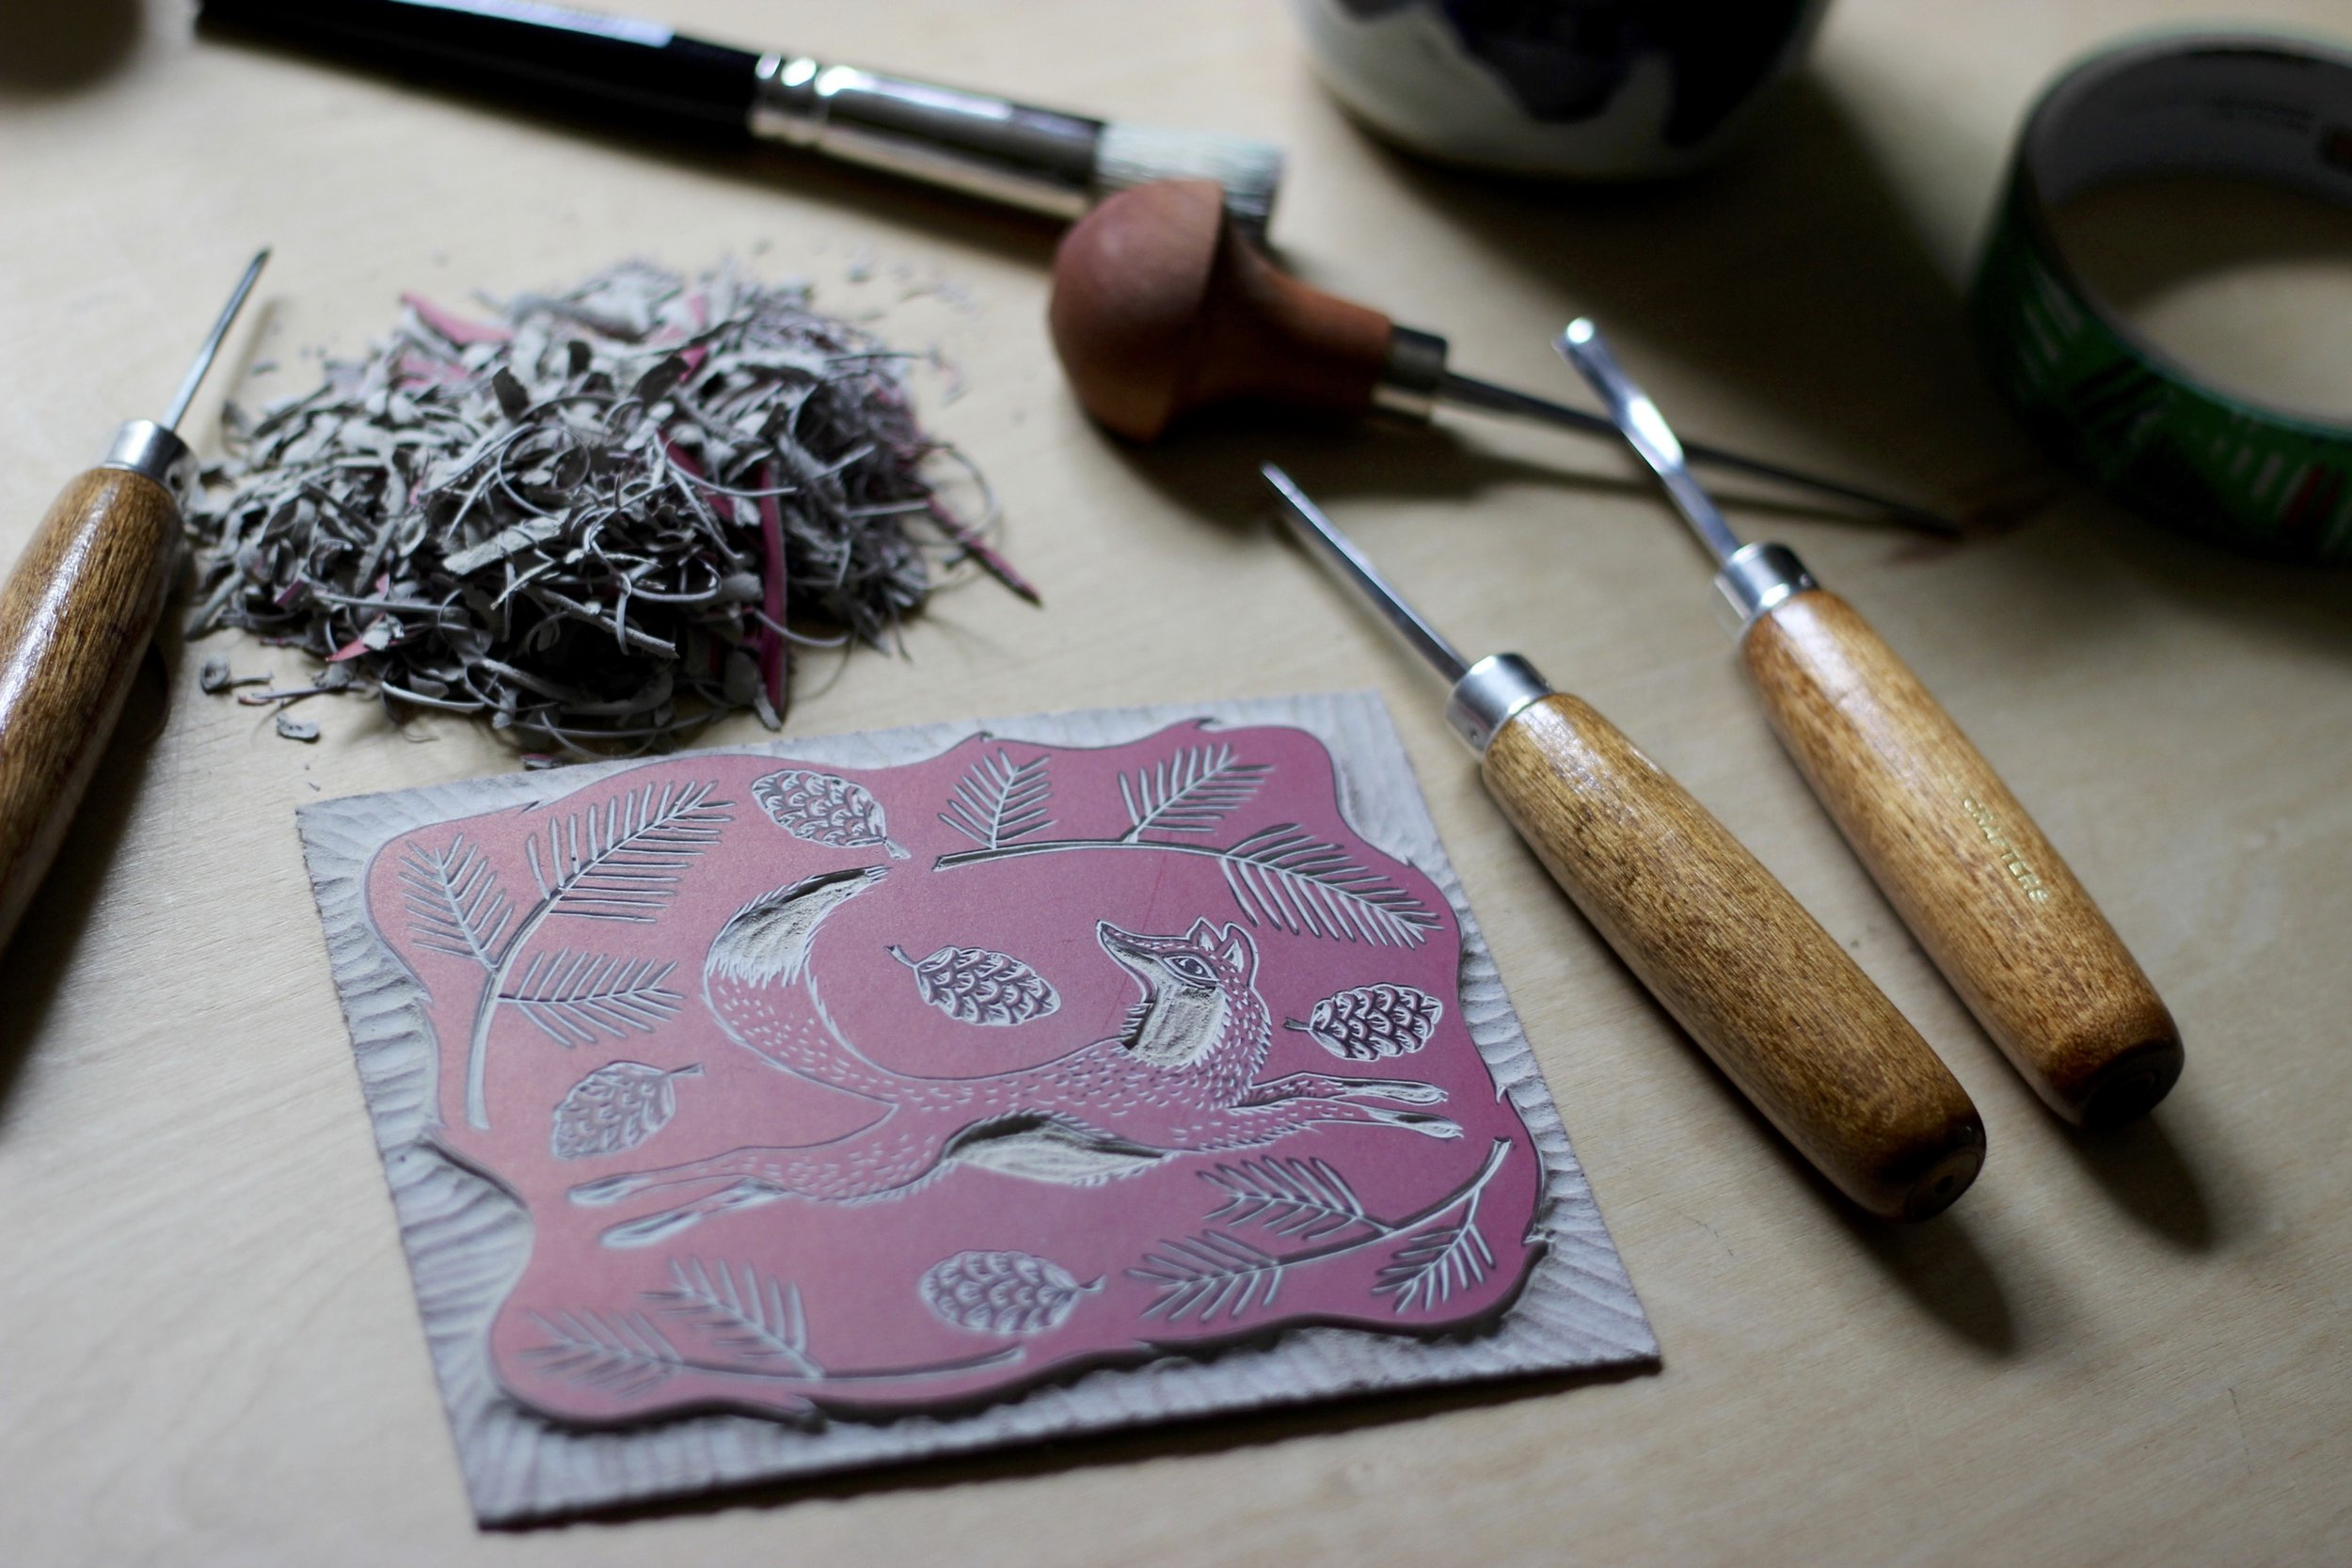 Fox linocut carving